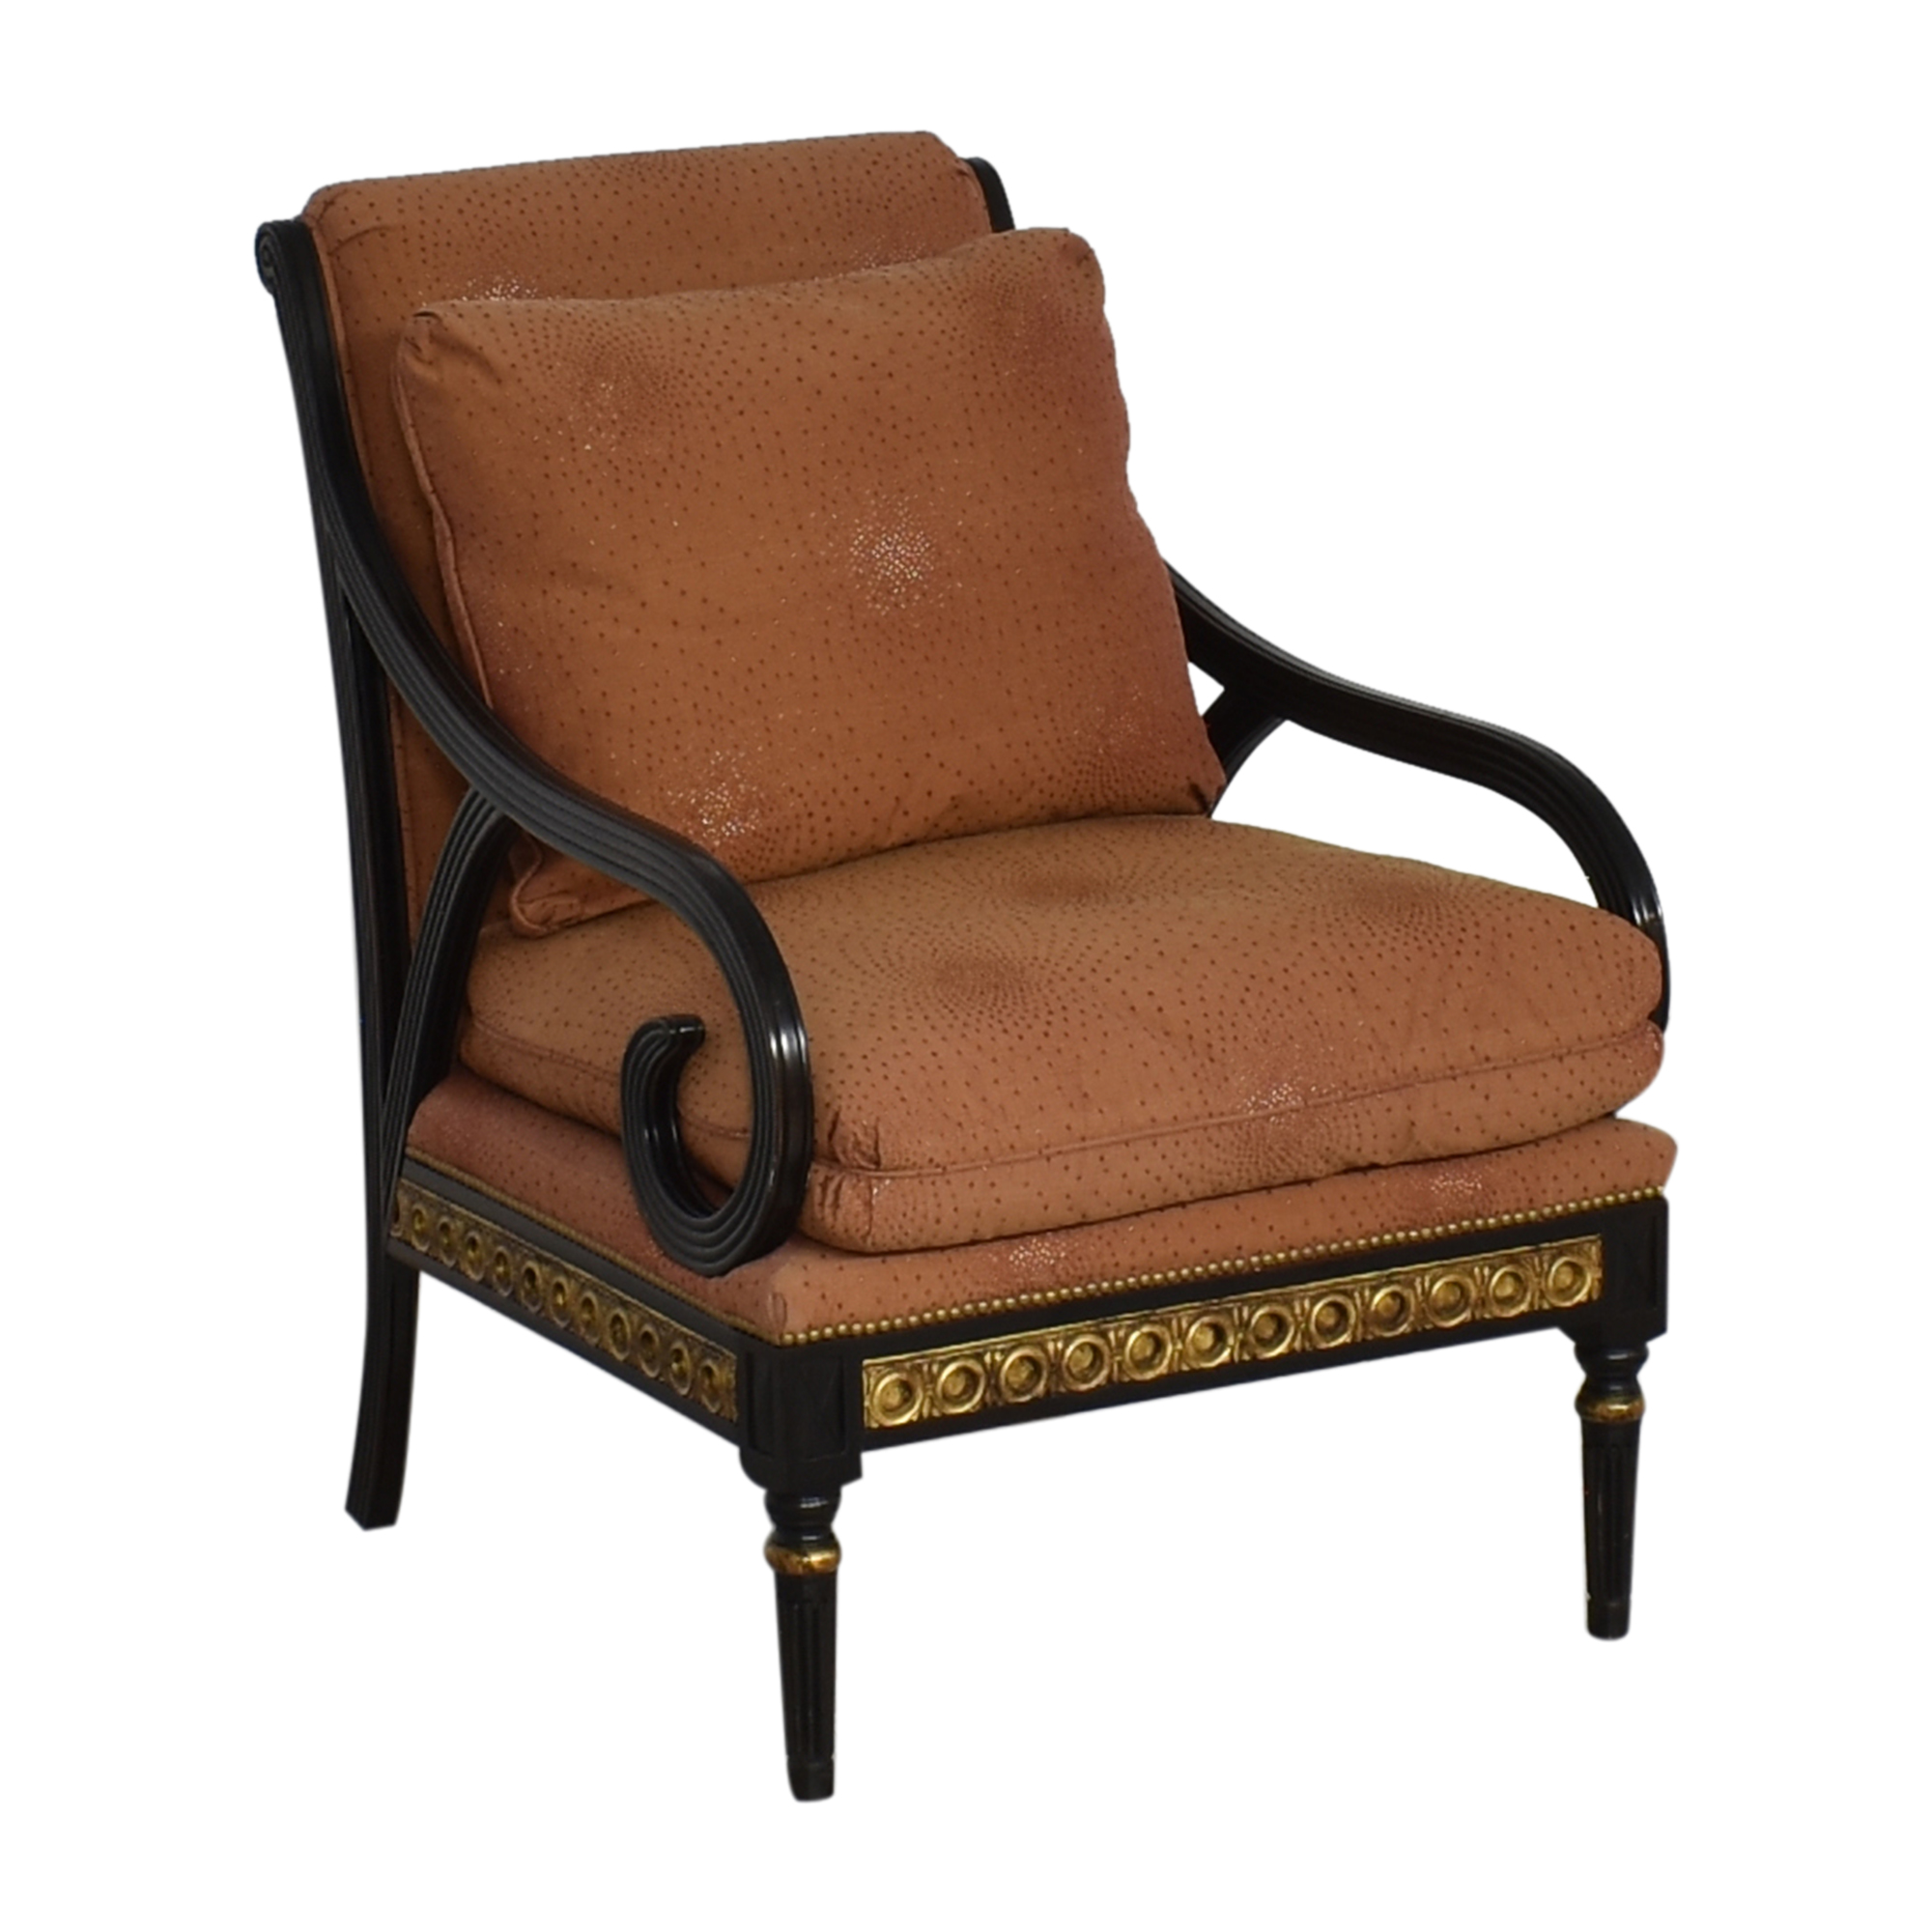 IMI Furniture IMI Furniture Scroll Arm Accent Chair pa